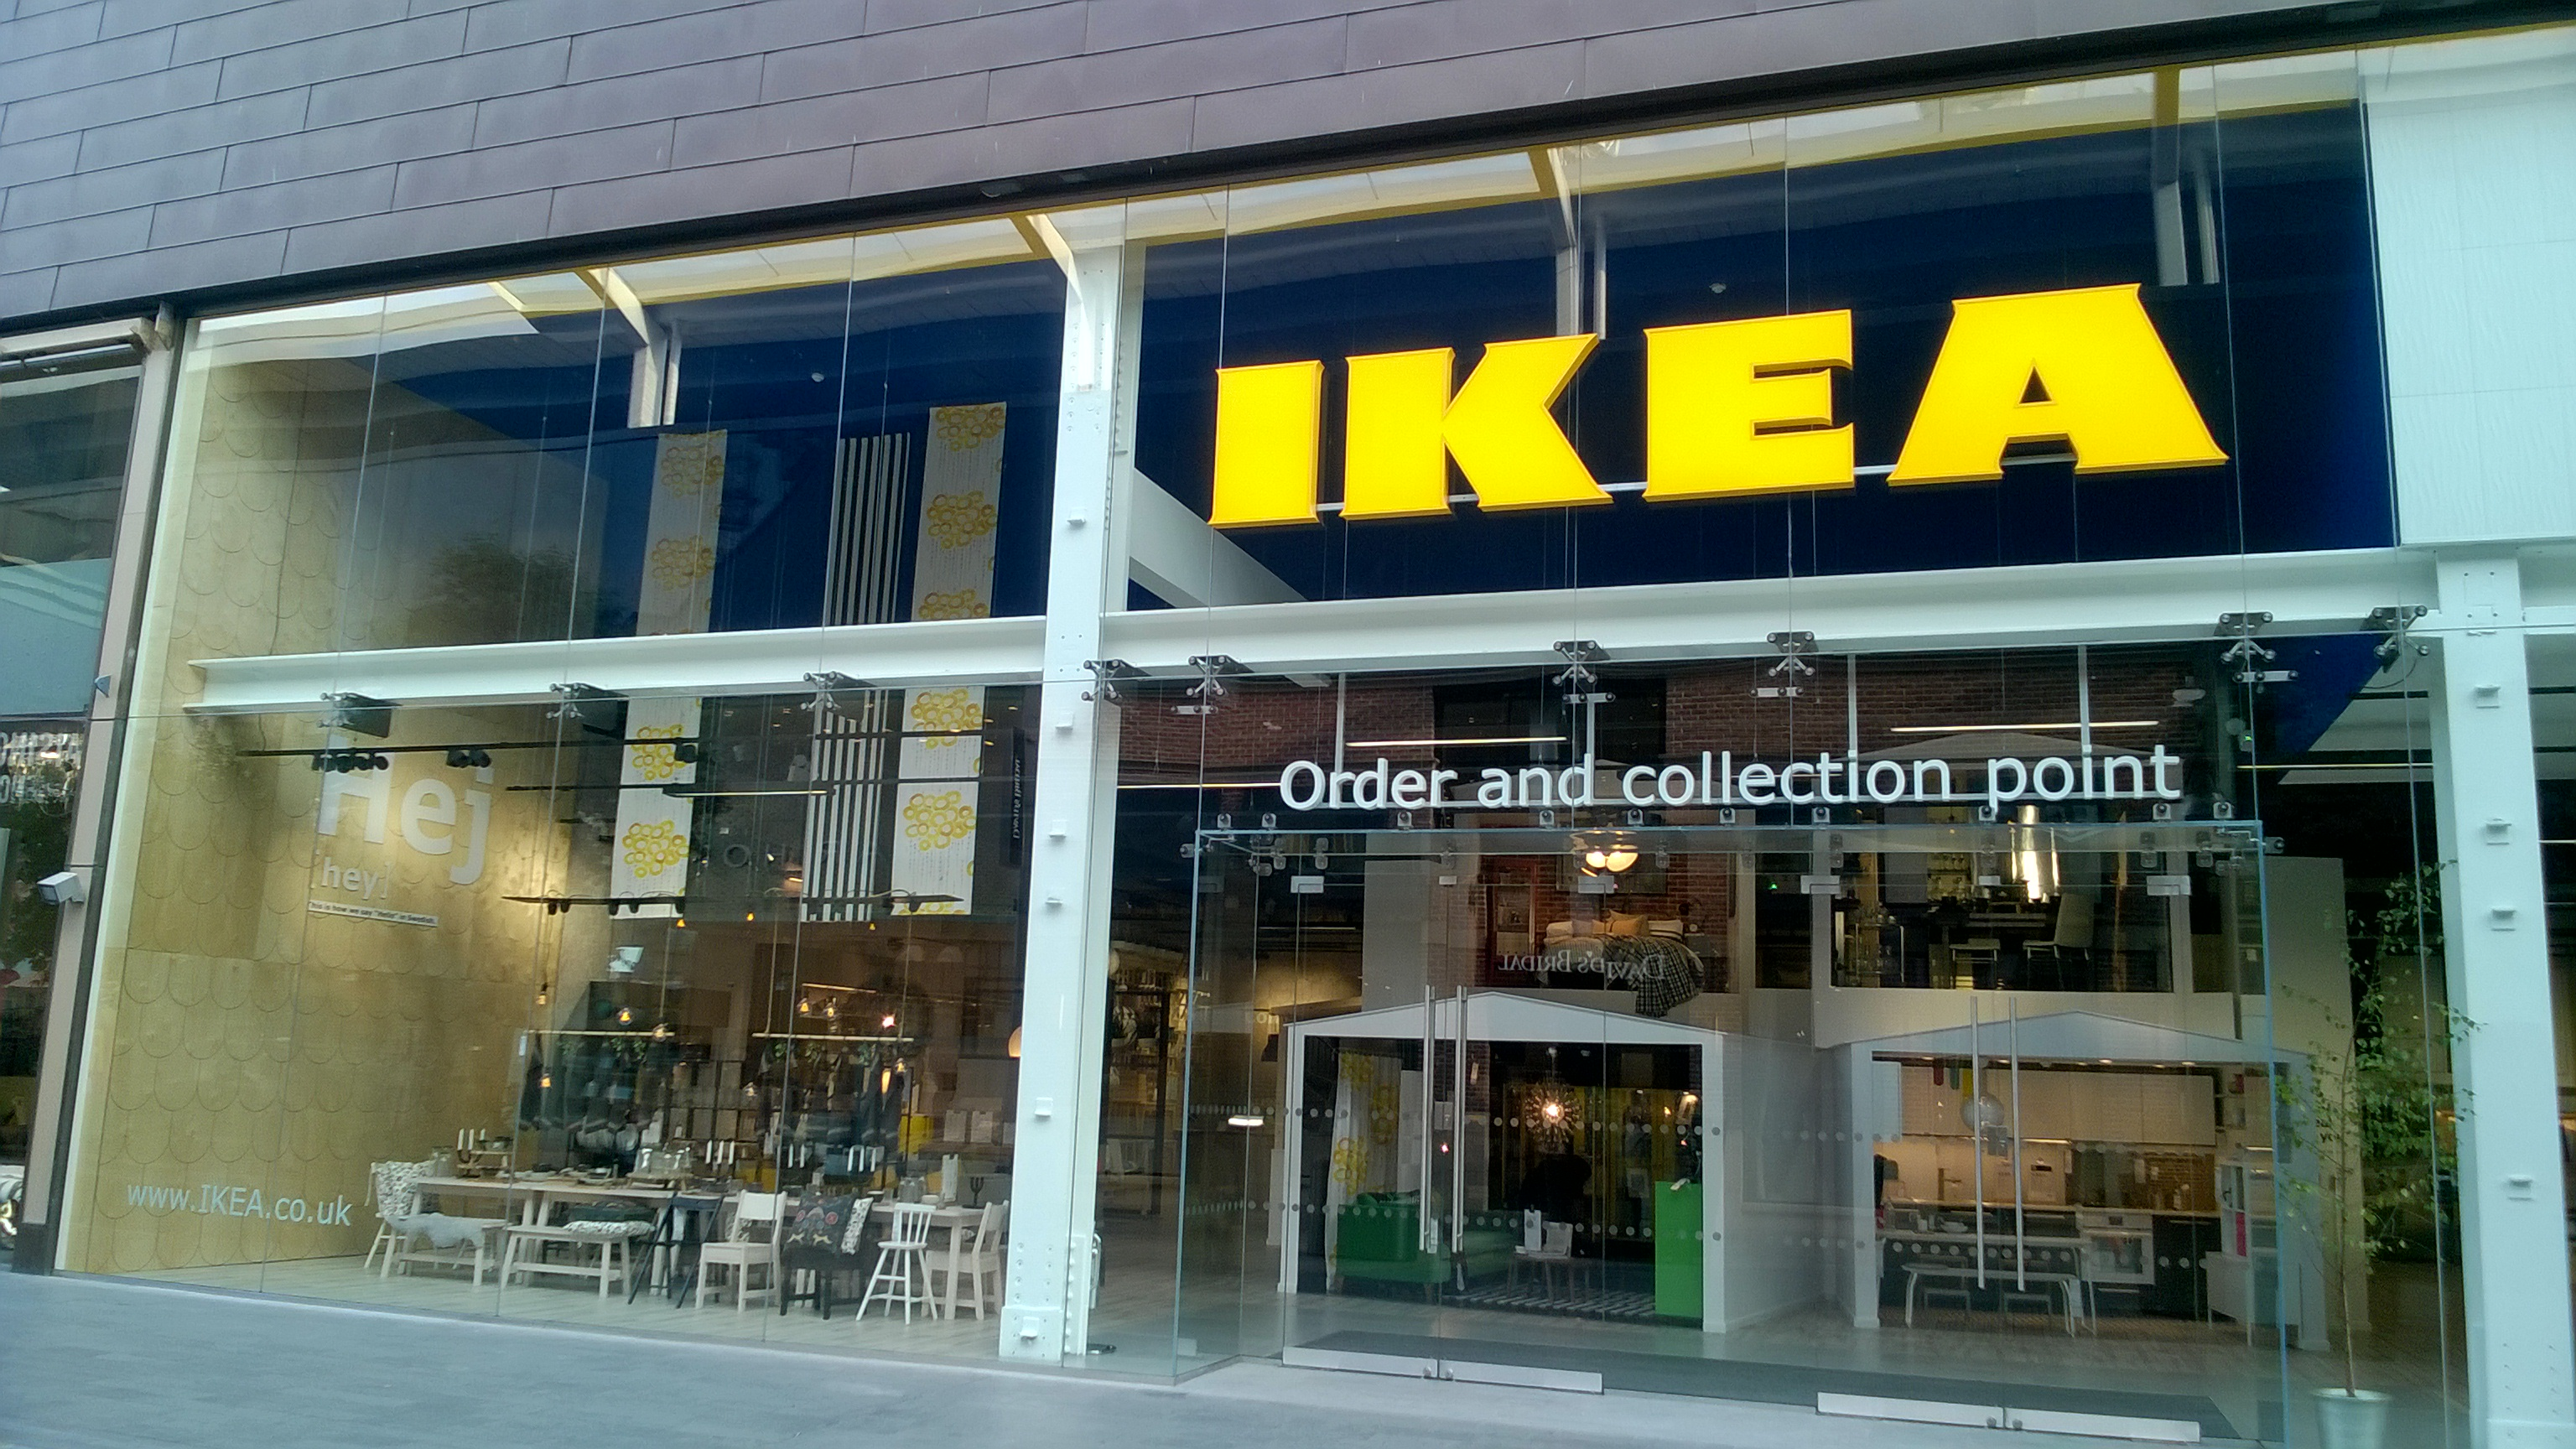 new ikea store opens westfield shopping centre stratford underwood carpenter. Black Bedroom Furniture Sets. Home Design Ideas